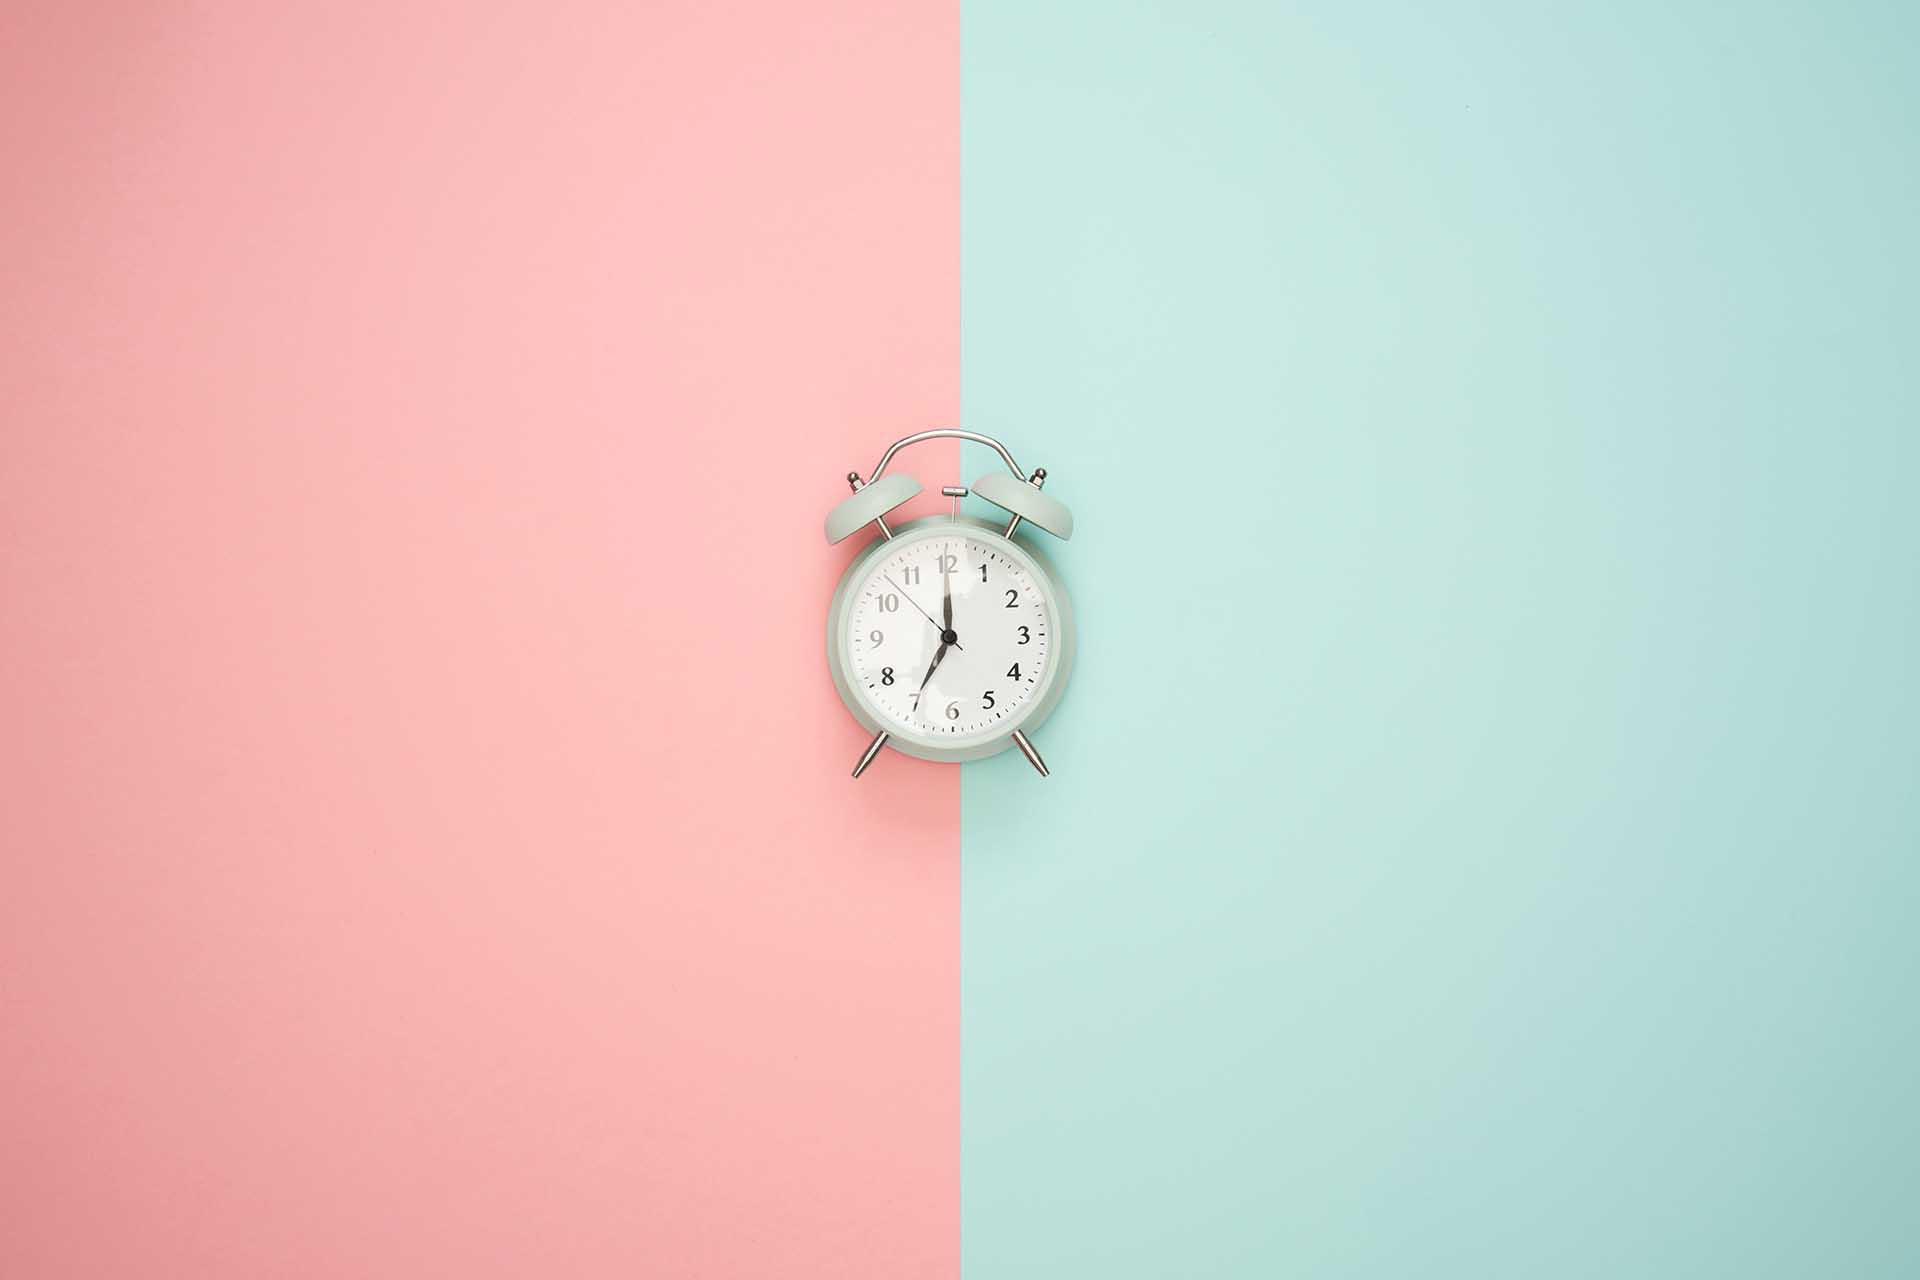 t2informatik Blog: Change needs time